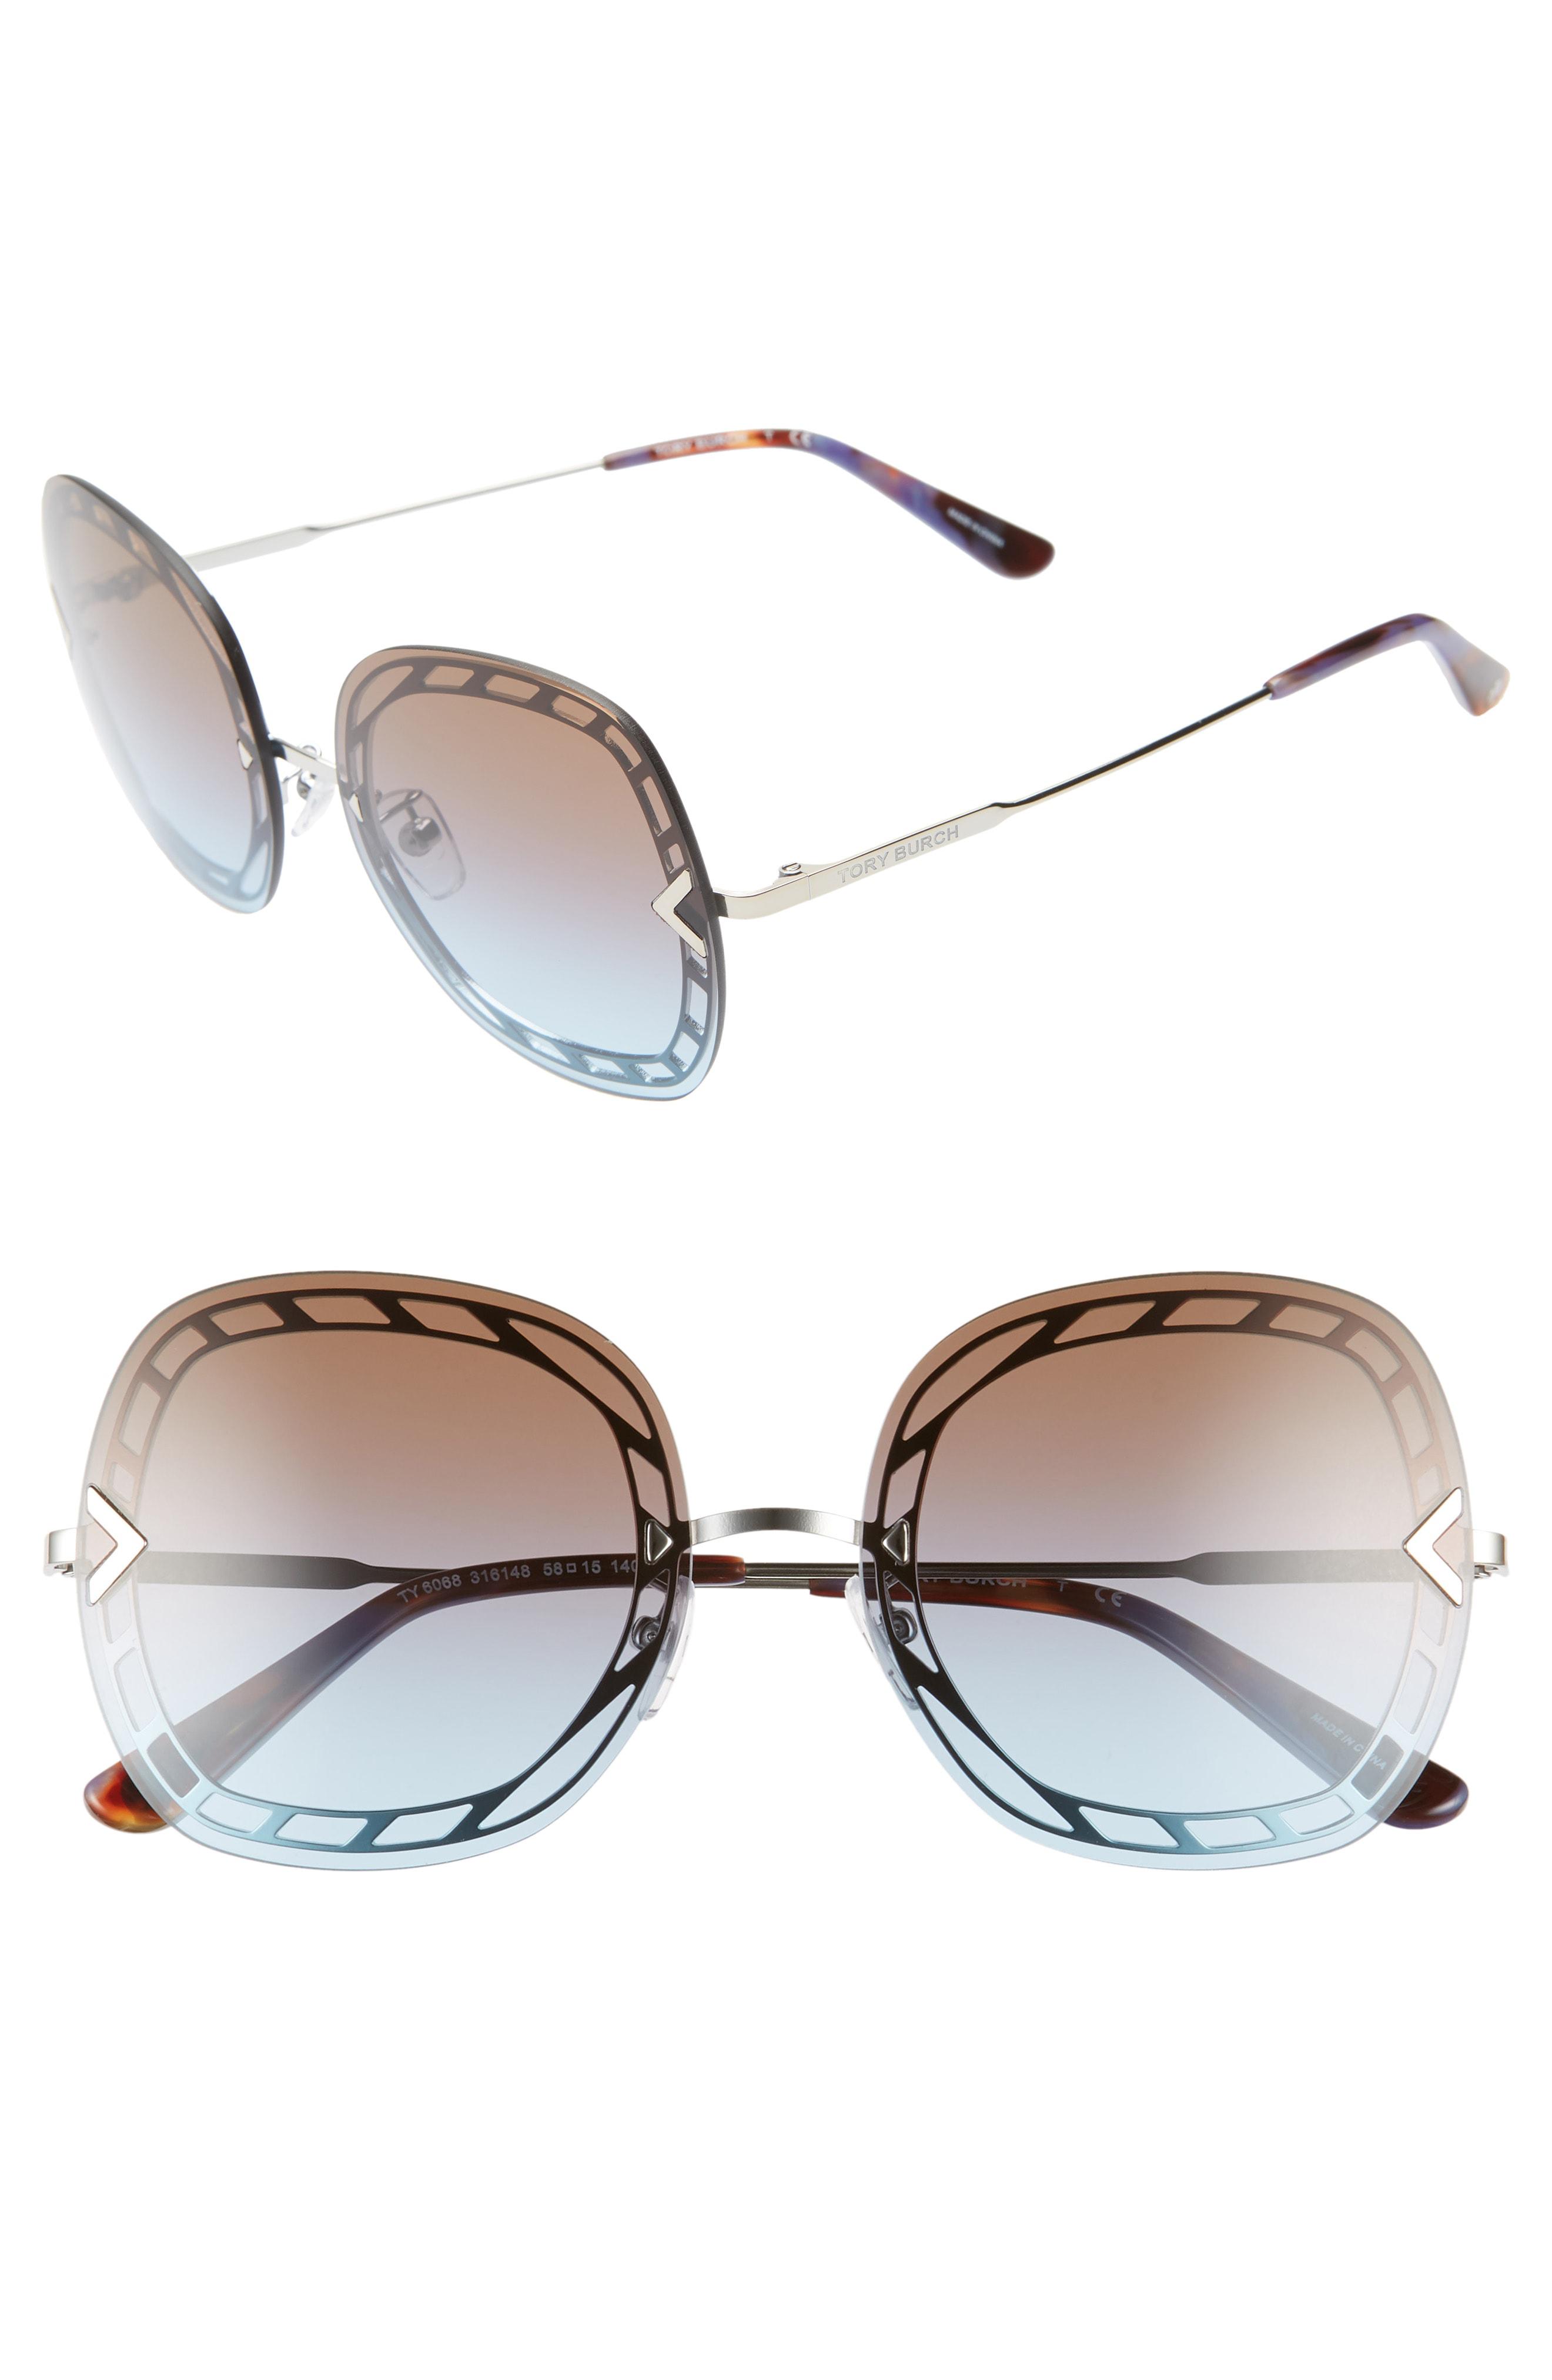 efae584a75f2 Tory Burch 58Mm Gradient Square Sunglasses - Silver/ Purple Gradient In  Brown